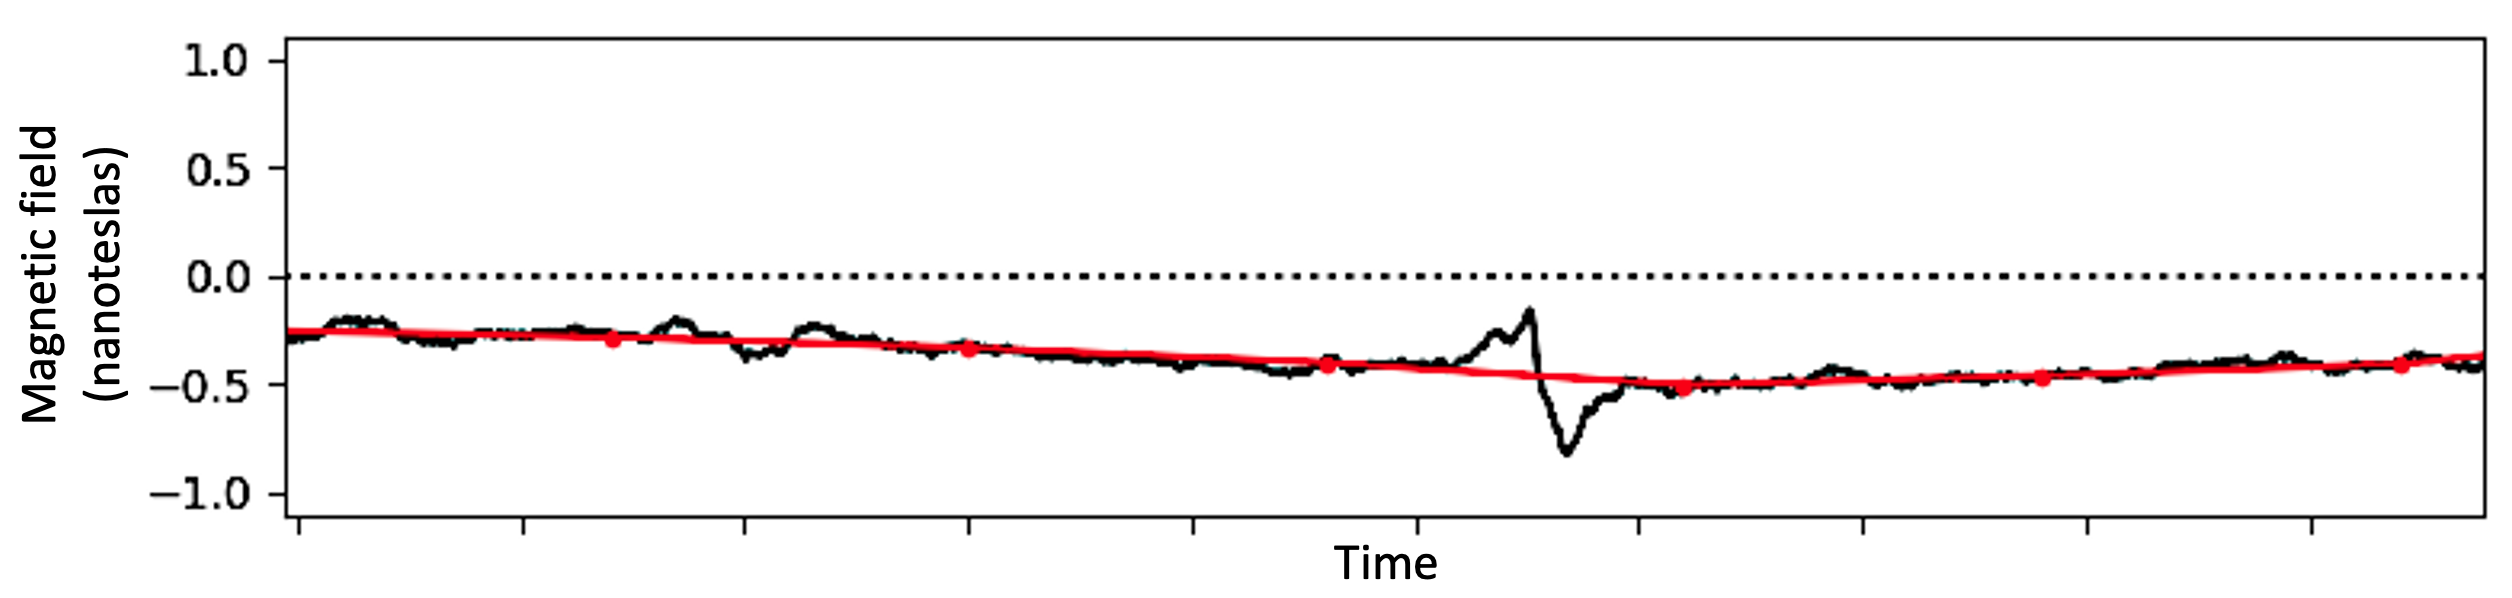 https://www.nasa.gov/sites/default/files/thumbnails/image/magnetometer_readings_0.png